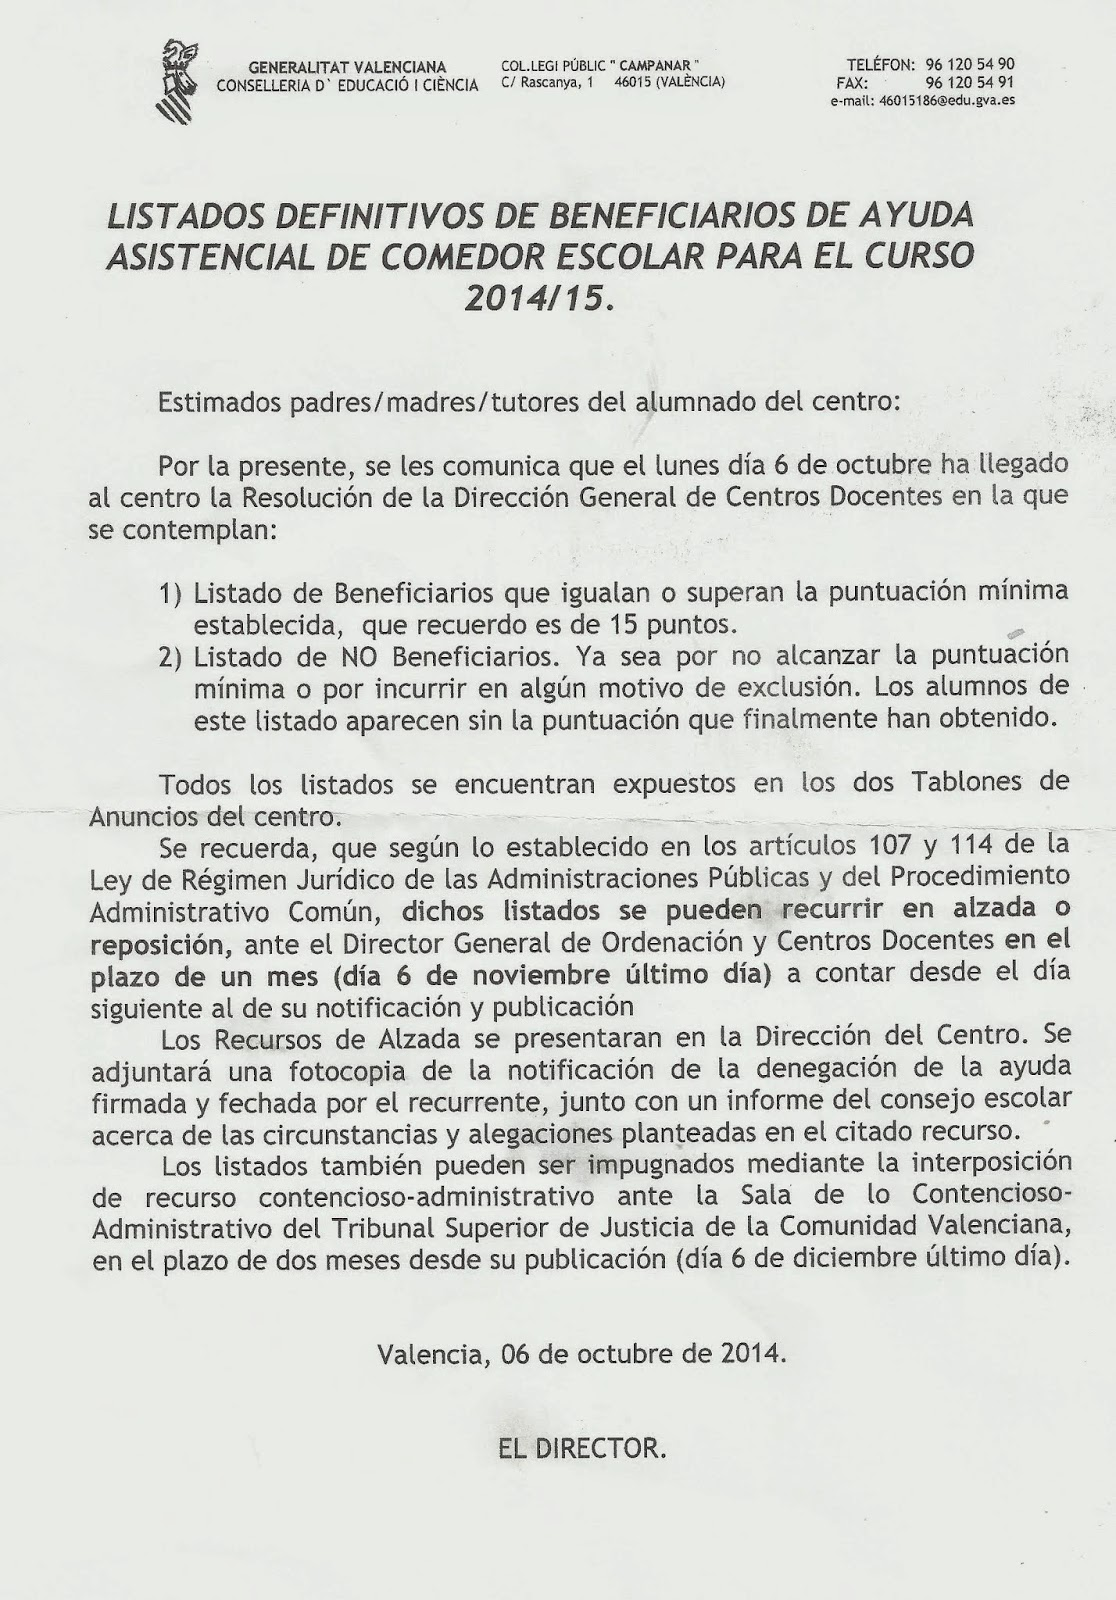 Comedor Escolar Valencia Beca | El Pp Cifra En 200 Millones Un ...